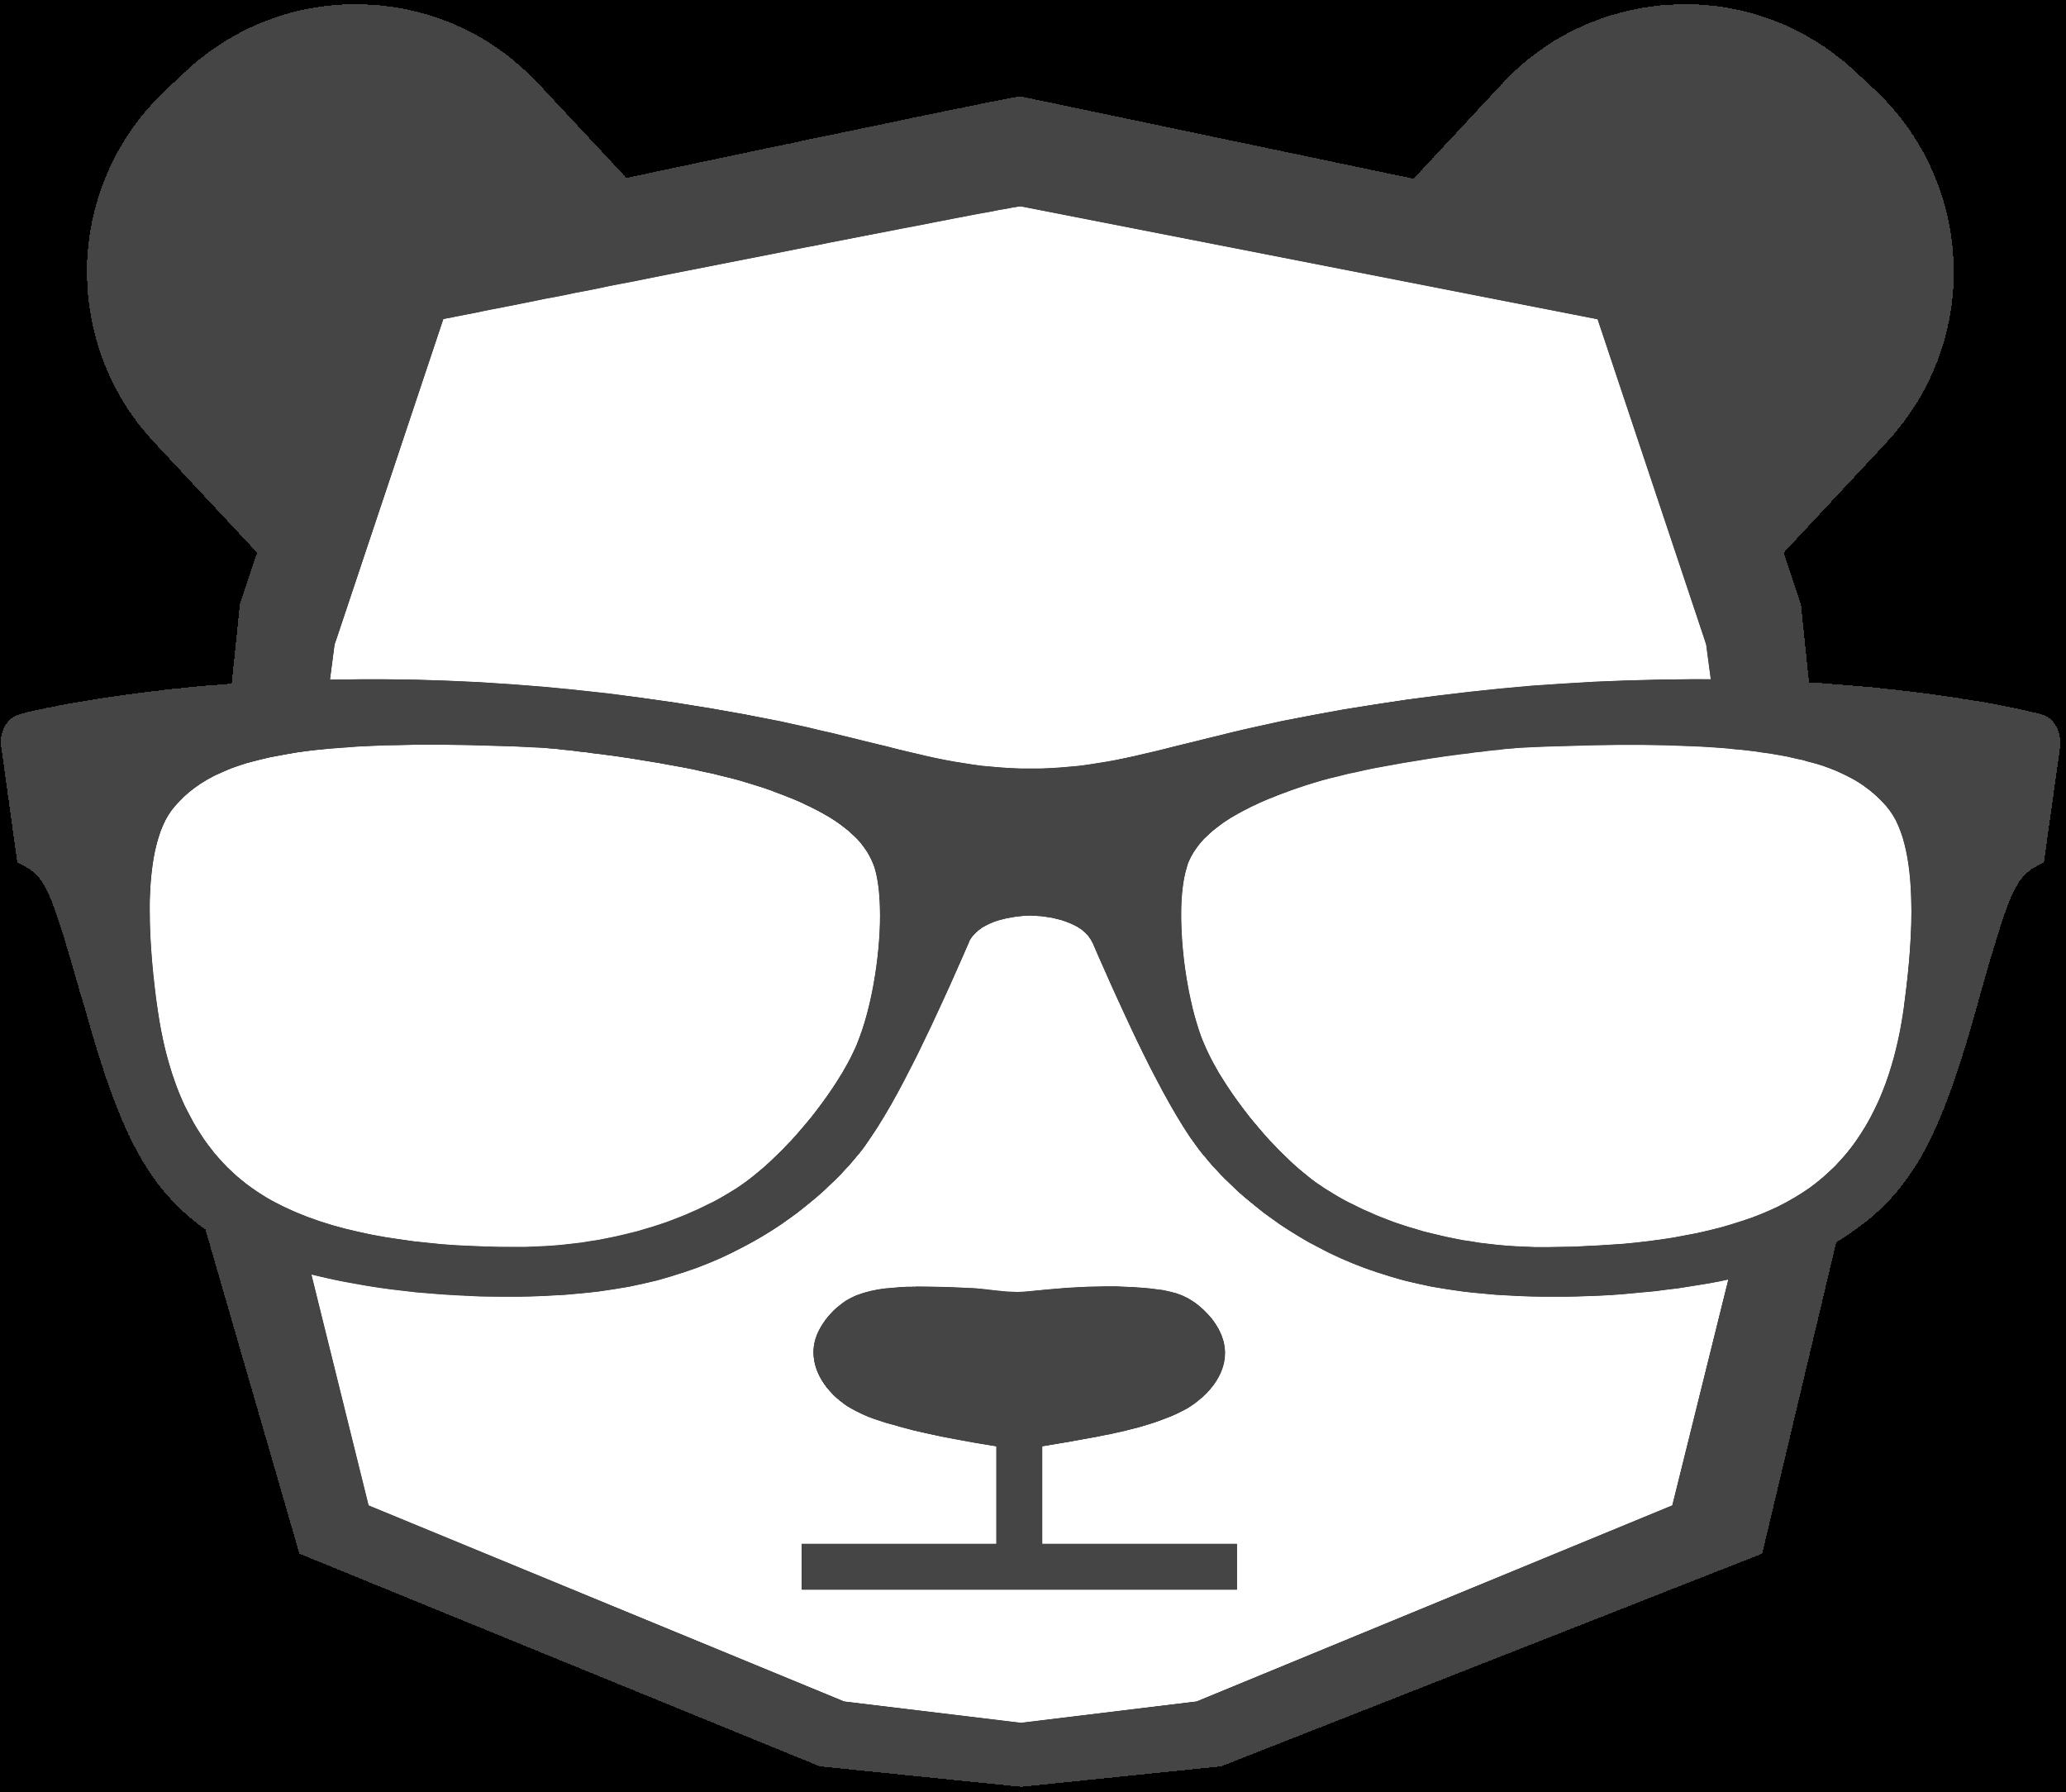 Big Panda 徽标